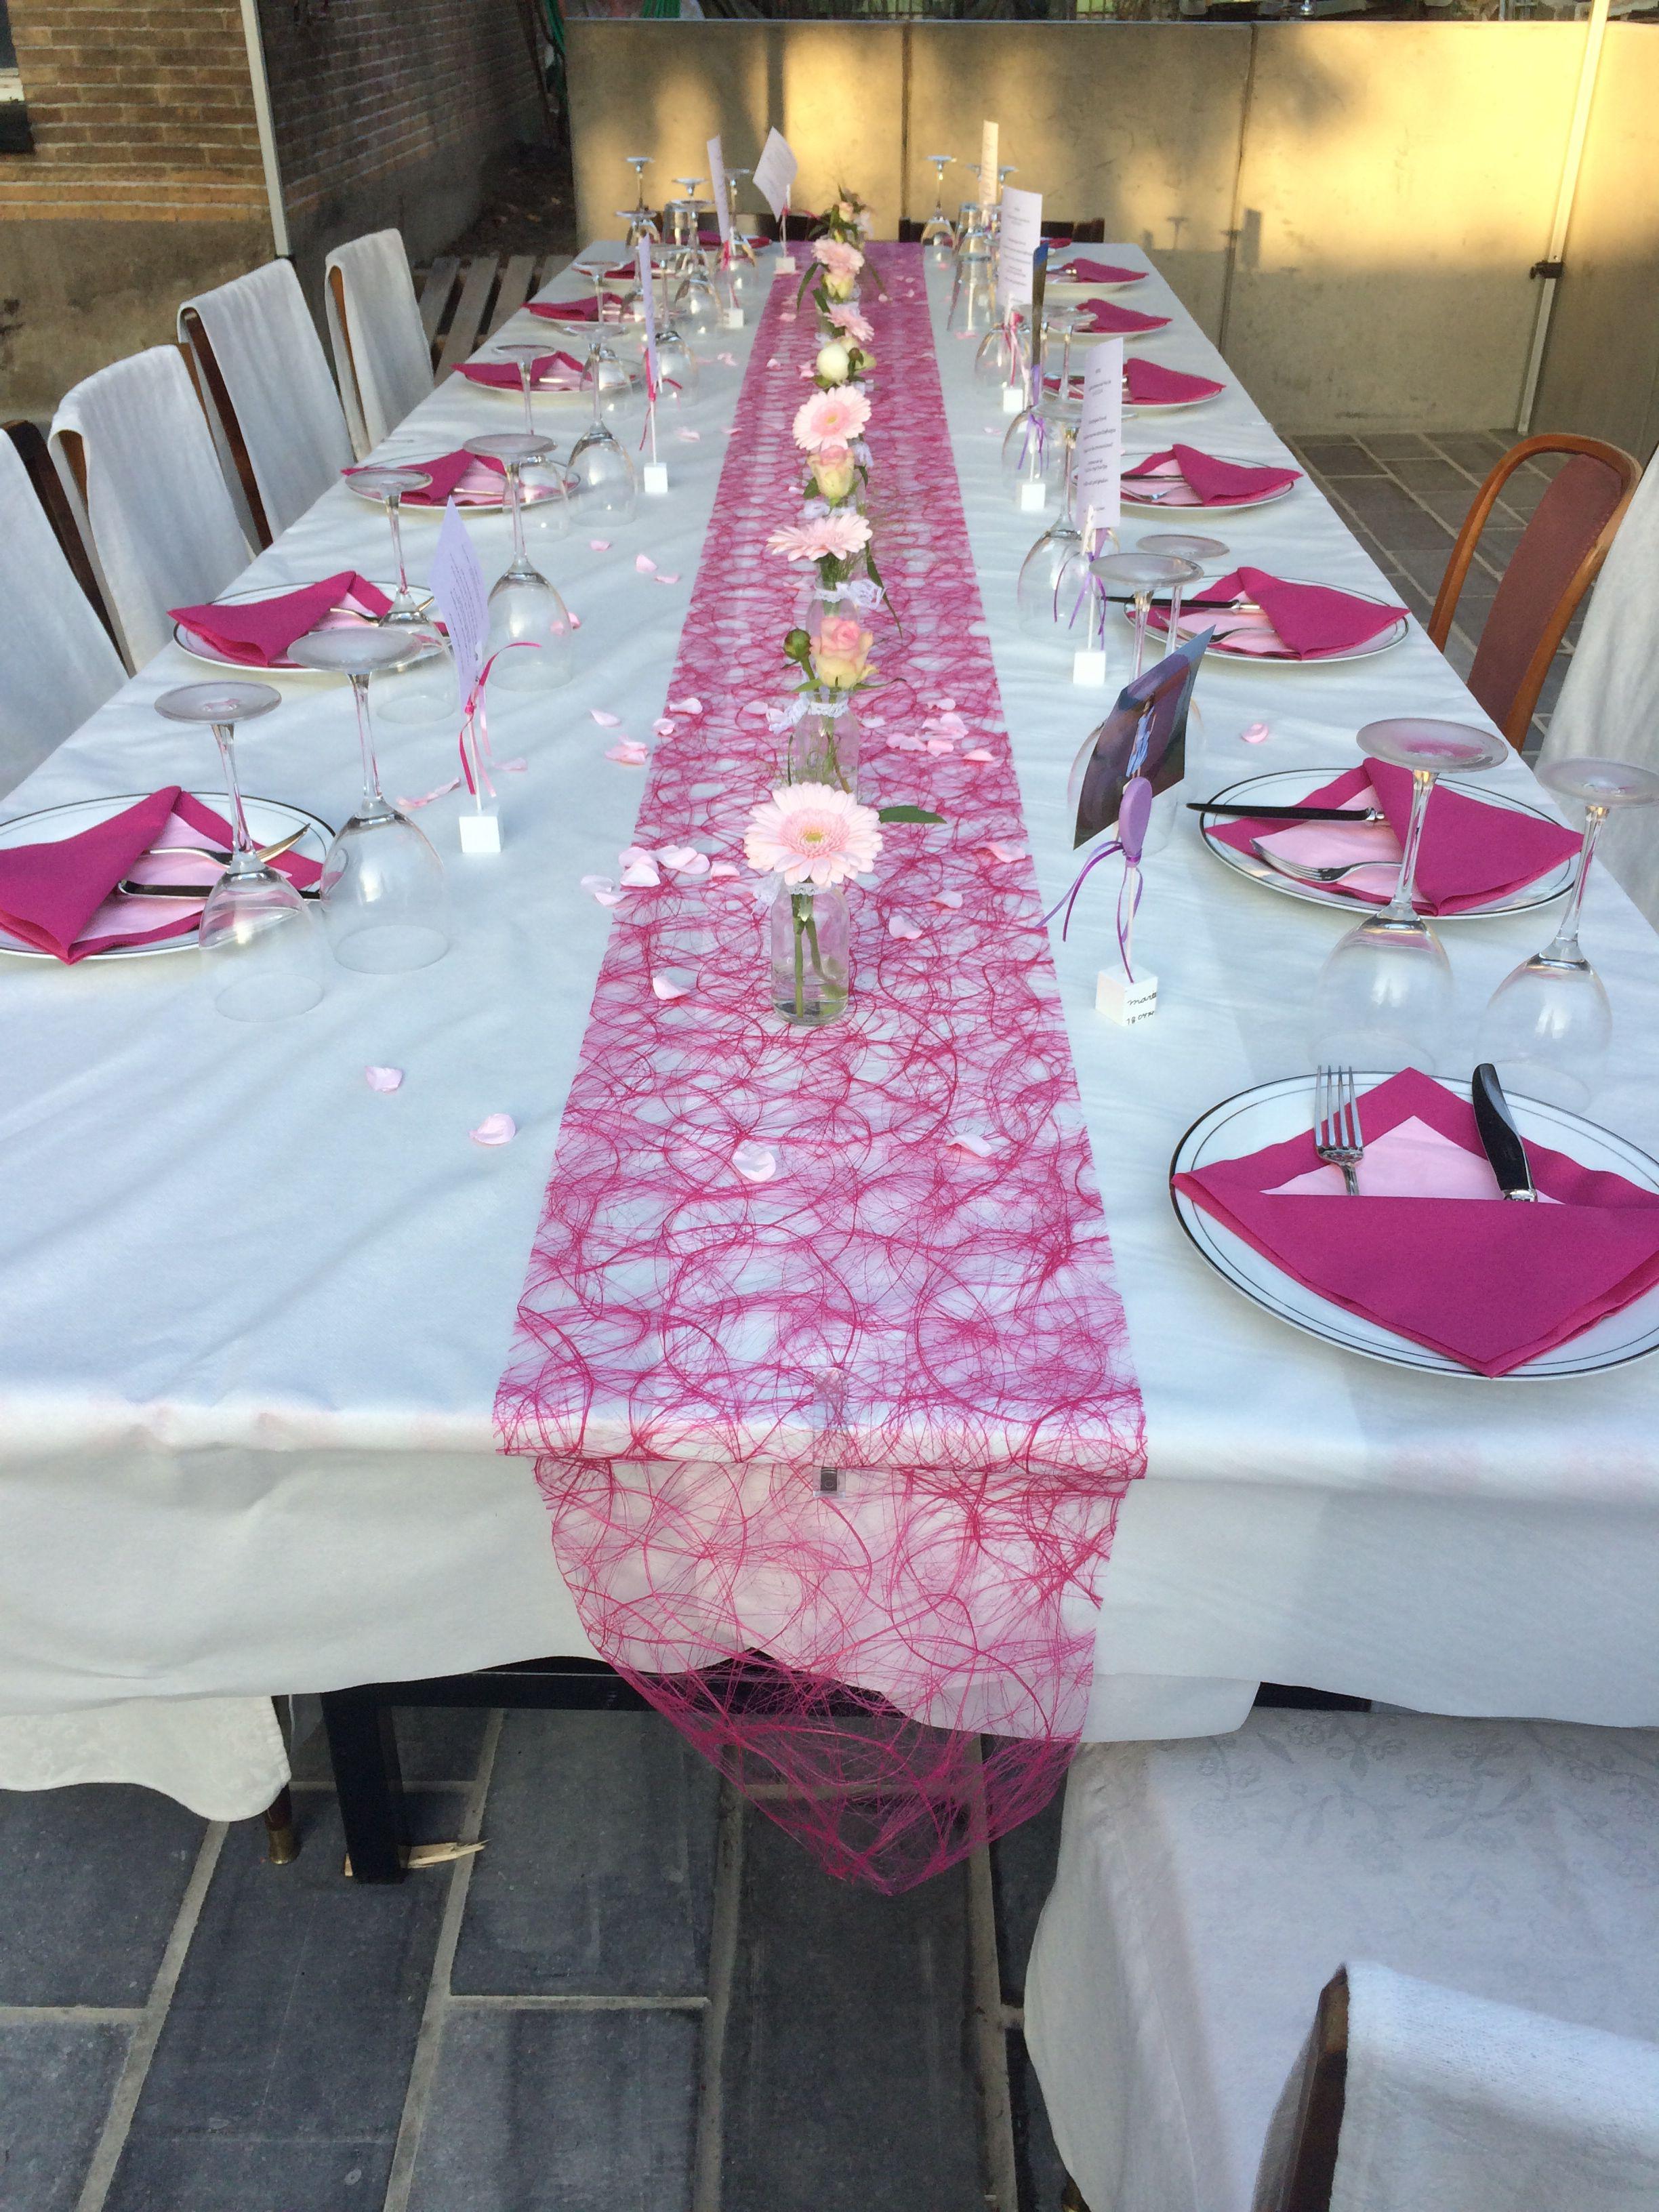 Communie tafel communiefeest lars pinterest roze eerste communie en tafelversiering - Versier een kleine woonkamer ...